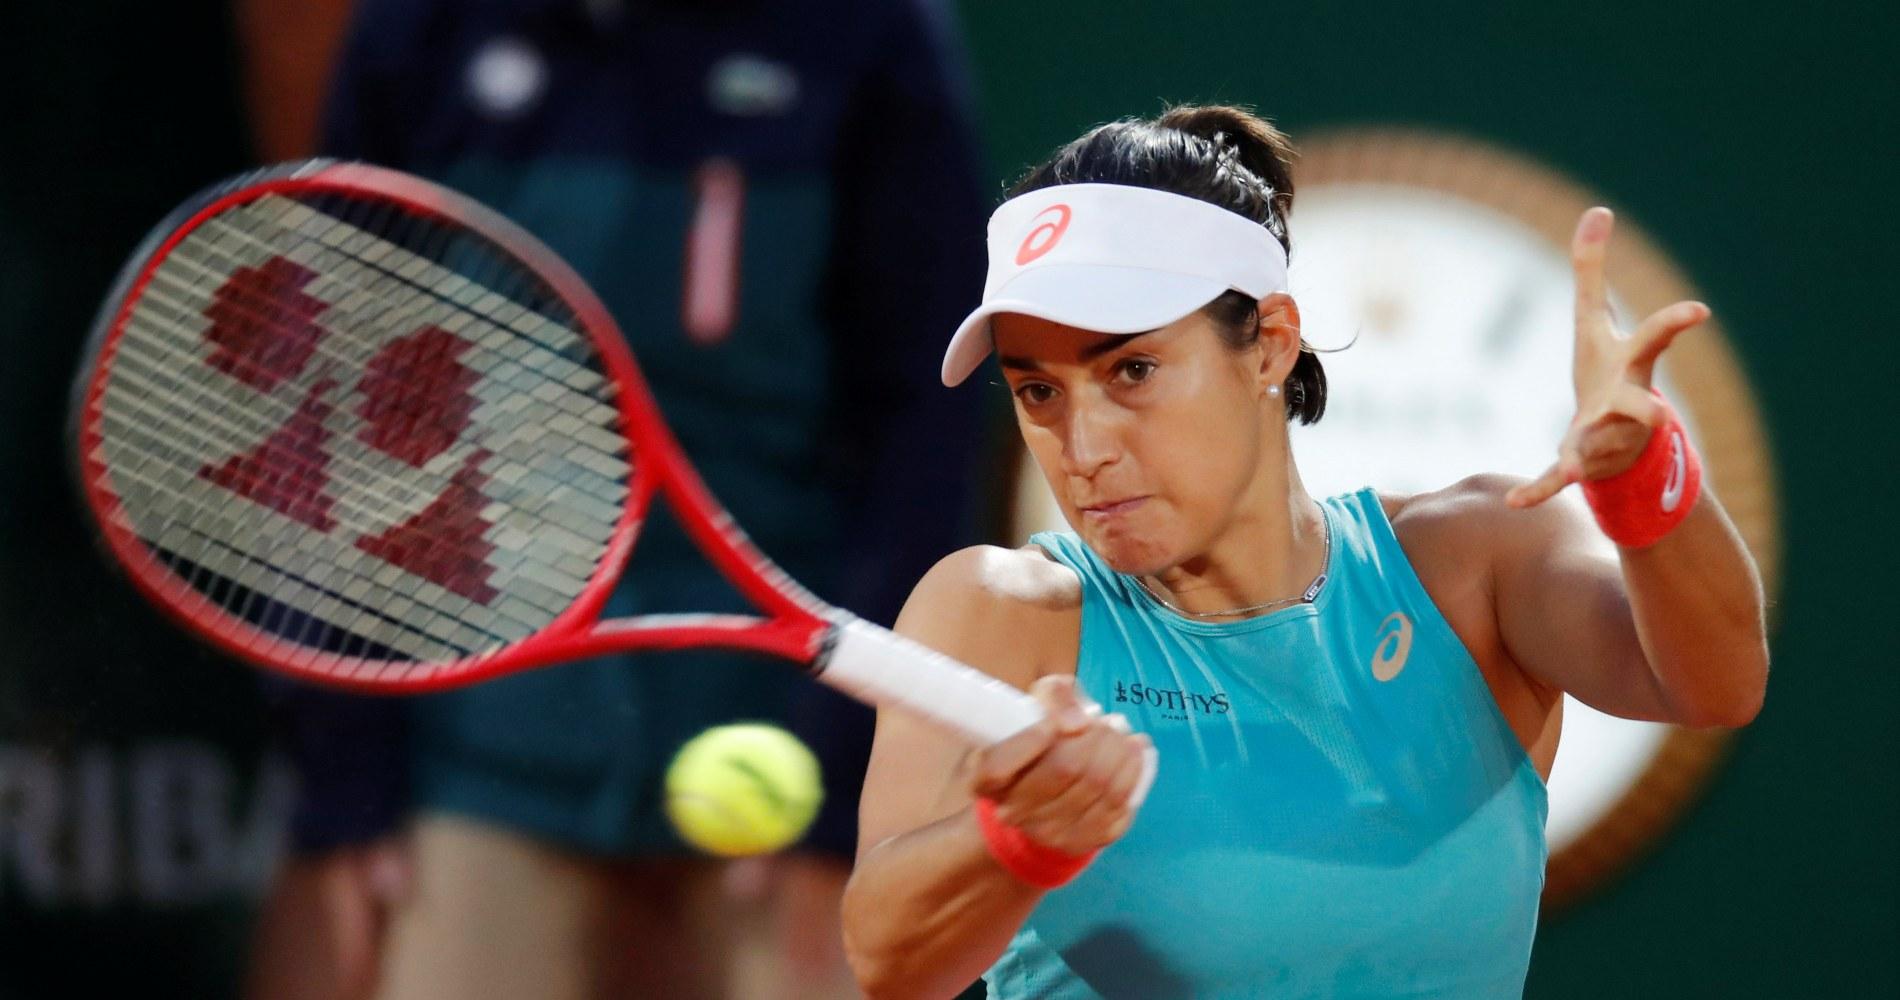 Garcia Roland Garros 2020